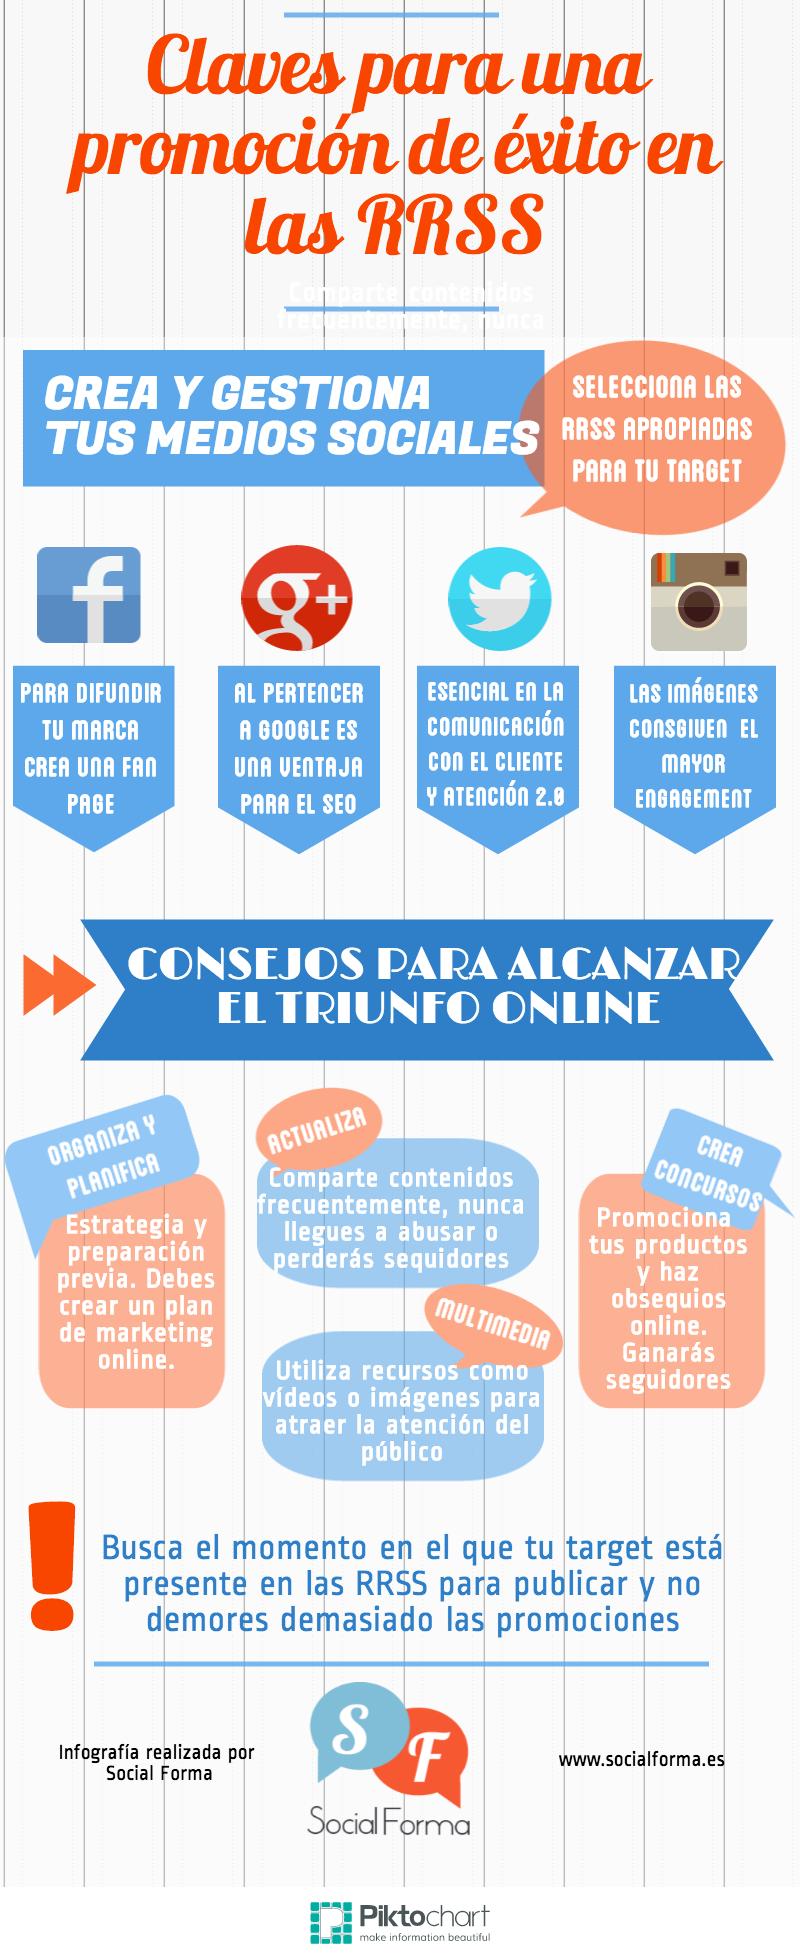 infografia_claves_propmocion_redes_sociales.png (800×1960)